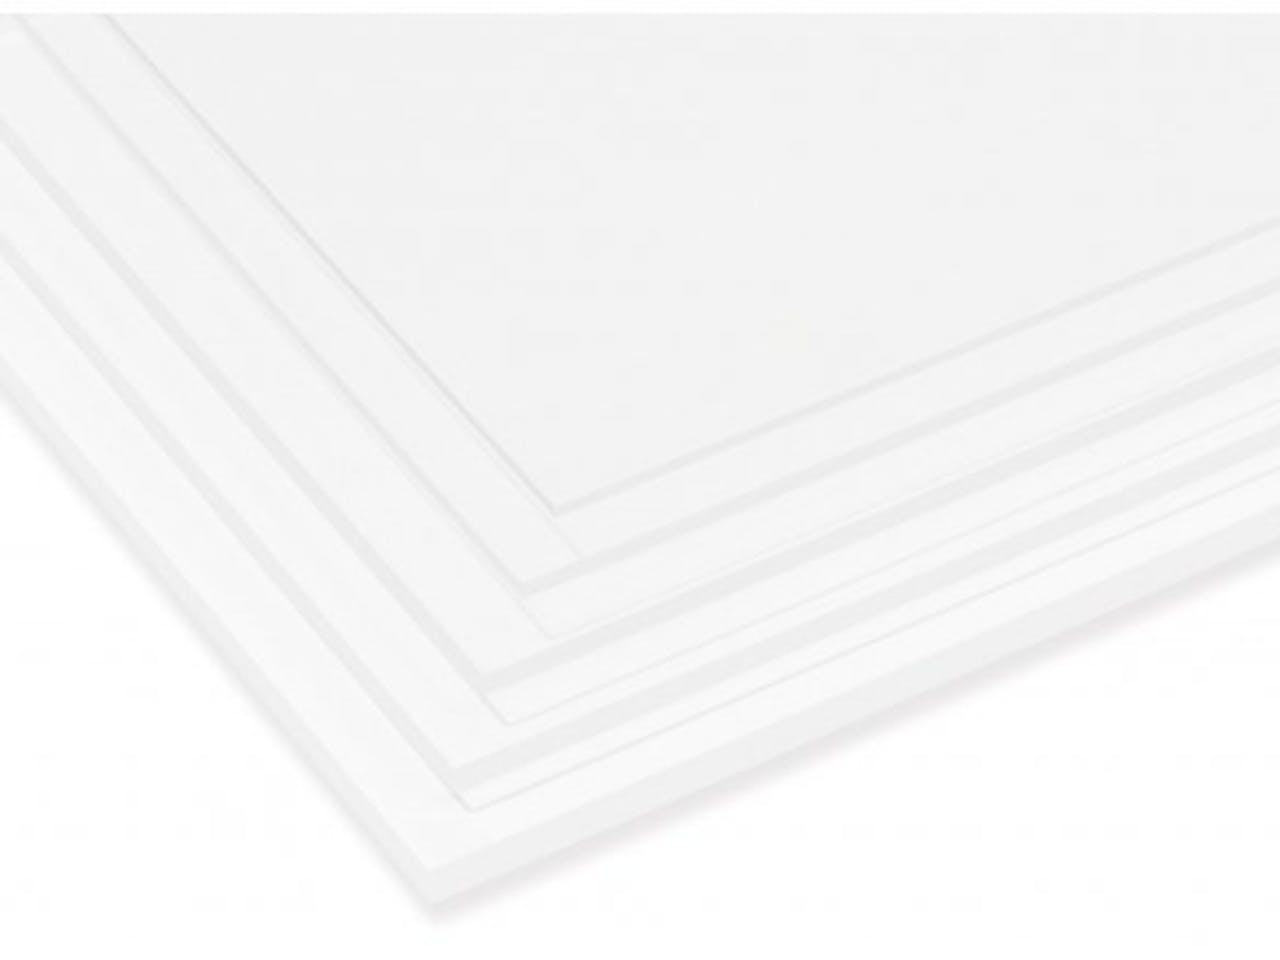 Acrylglas GS transparent, farblos, 4,00 x 120 x 250 mm